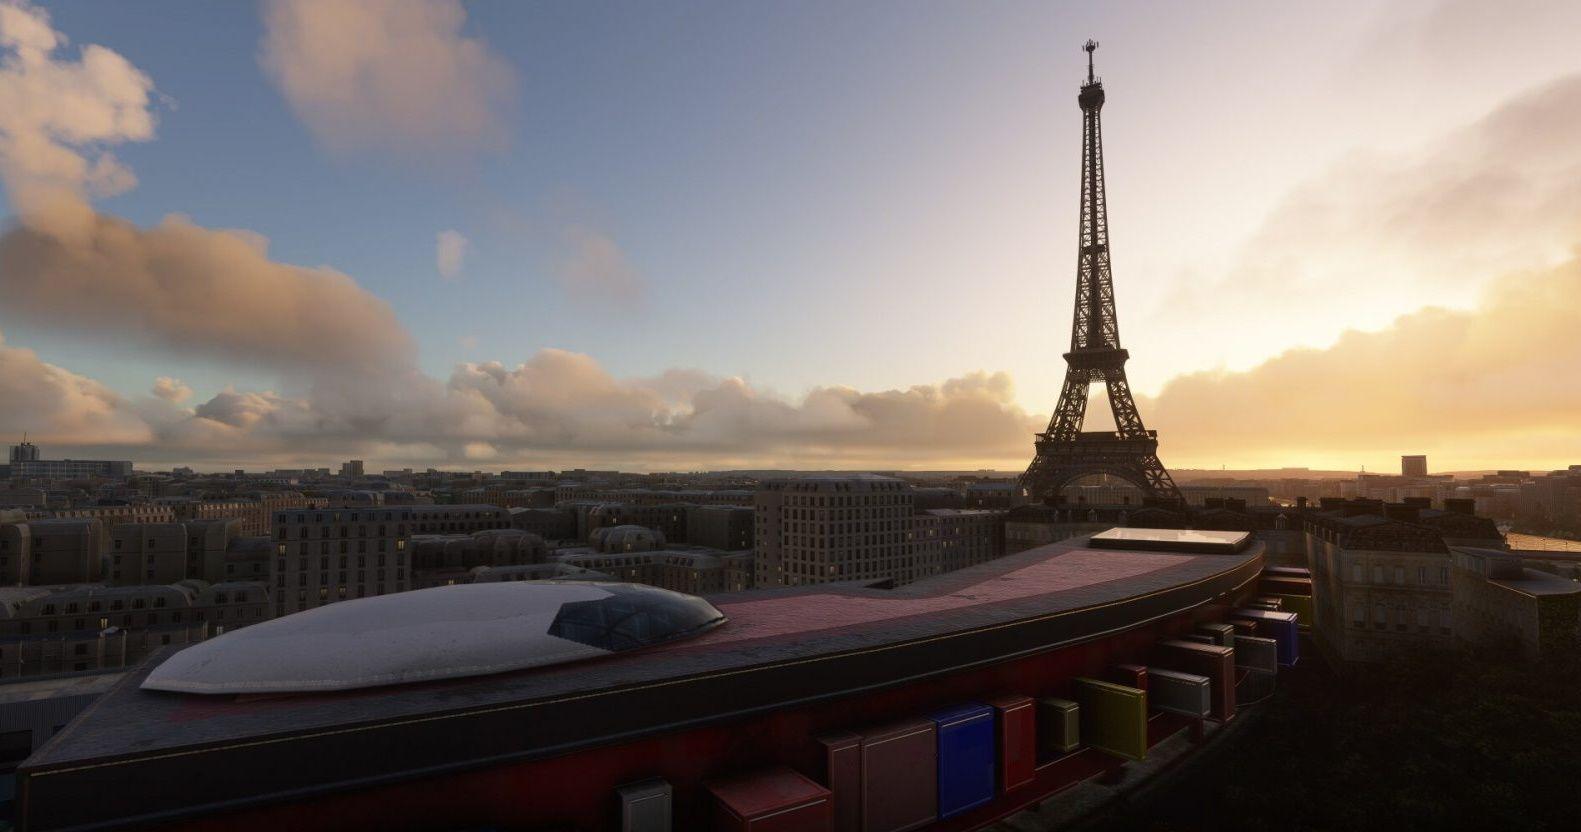 MSFS Paris Landmarks